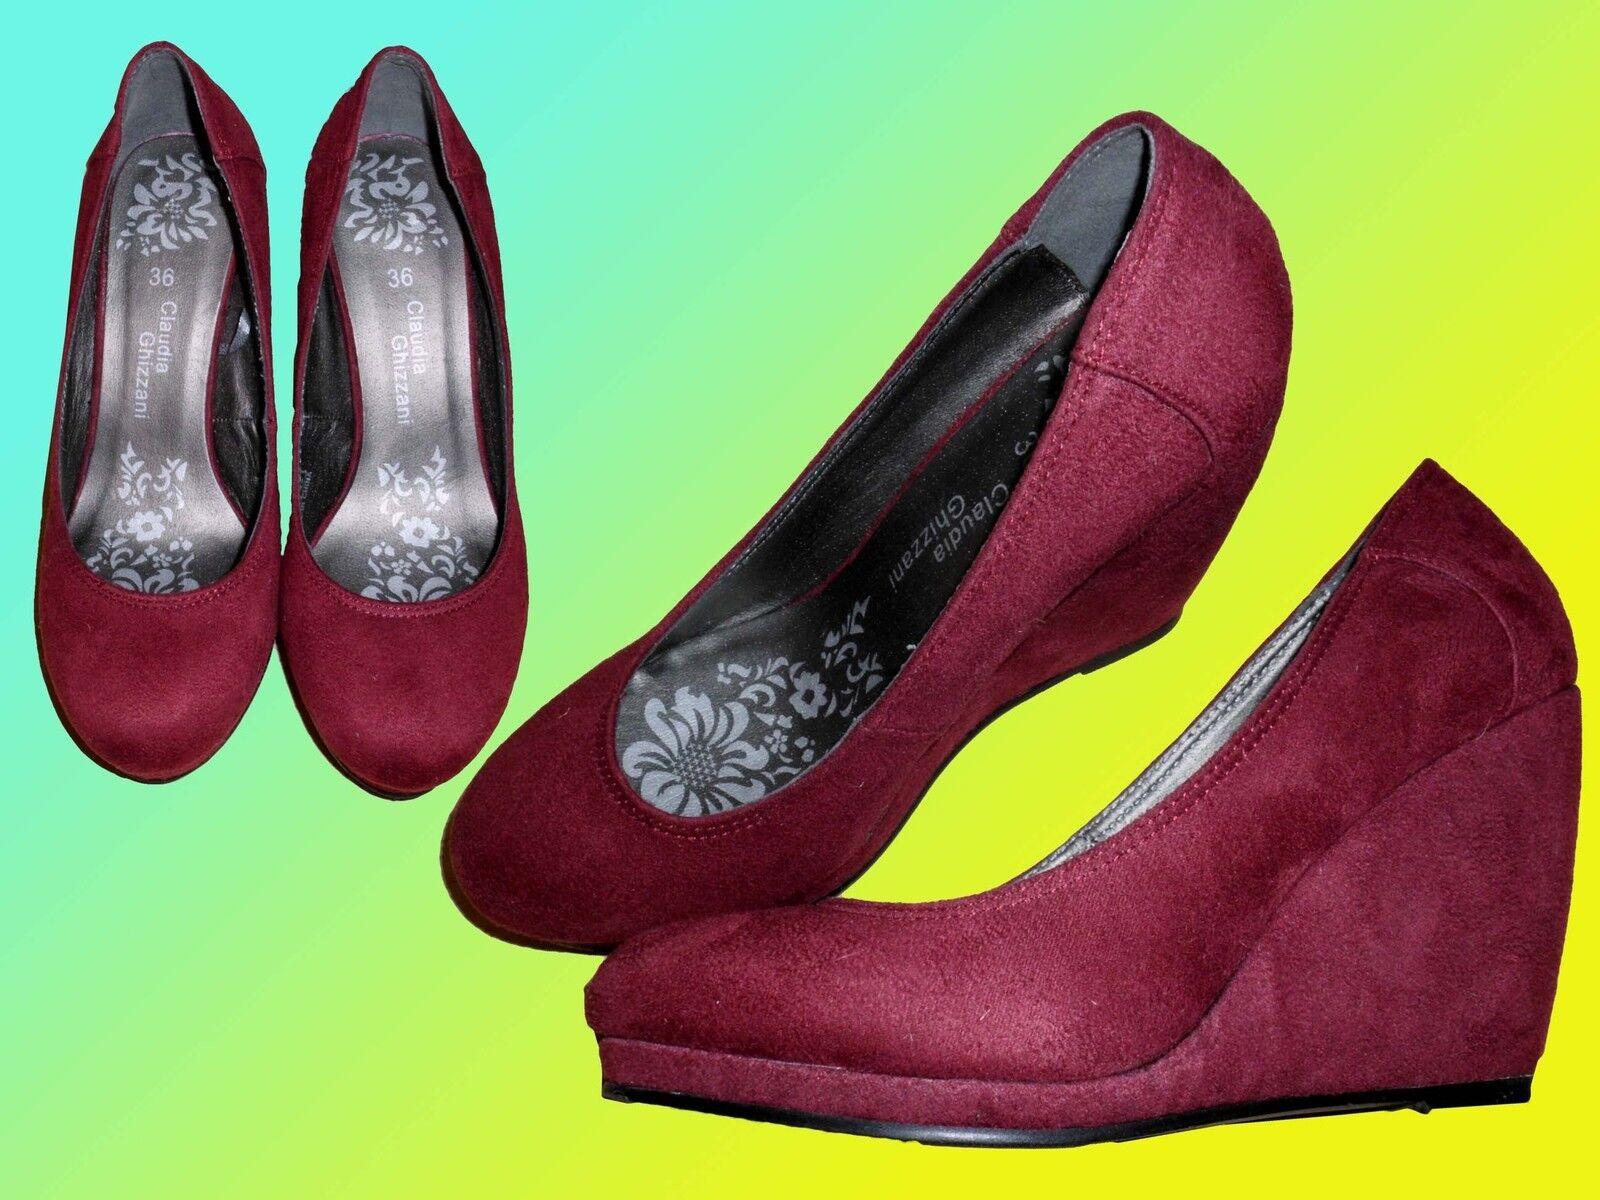 schicke weinrote hohe Damenschuhe Schuhe Wedges Platau Pumps  Gr. 36 Velour NEUa